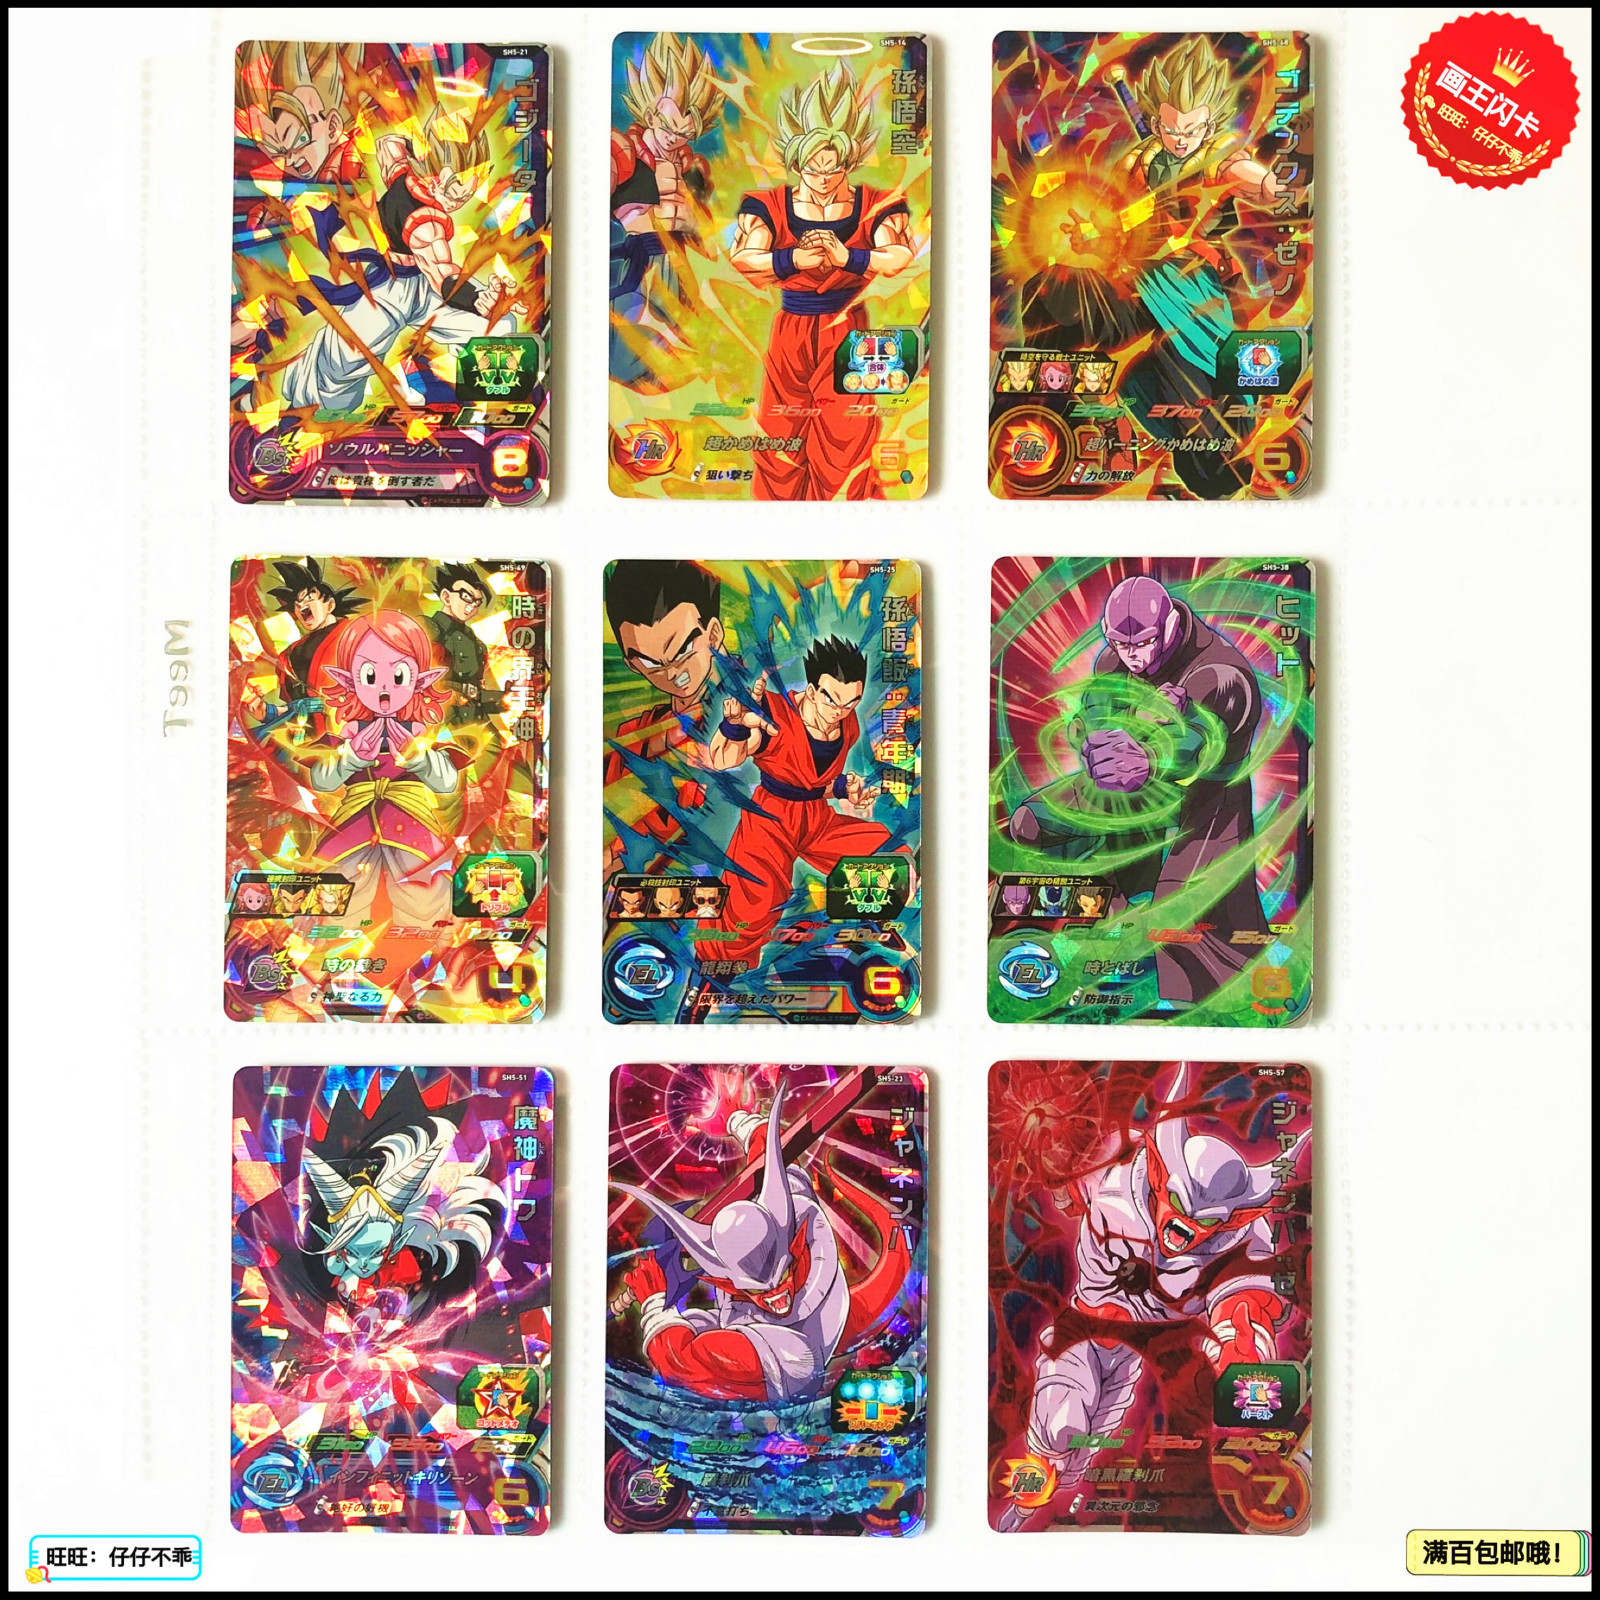 Japan Original Dragon Ball Hero Card SR Flash 3 Stars SH5 Goku Gogeta Hit Toys Hobbies Collectibles Game Collection Anime Cards